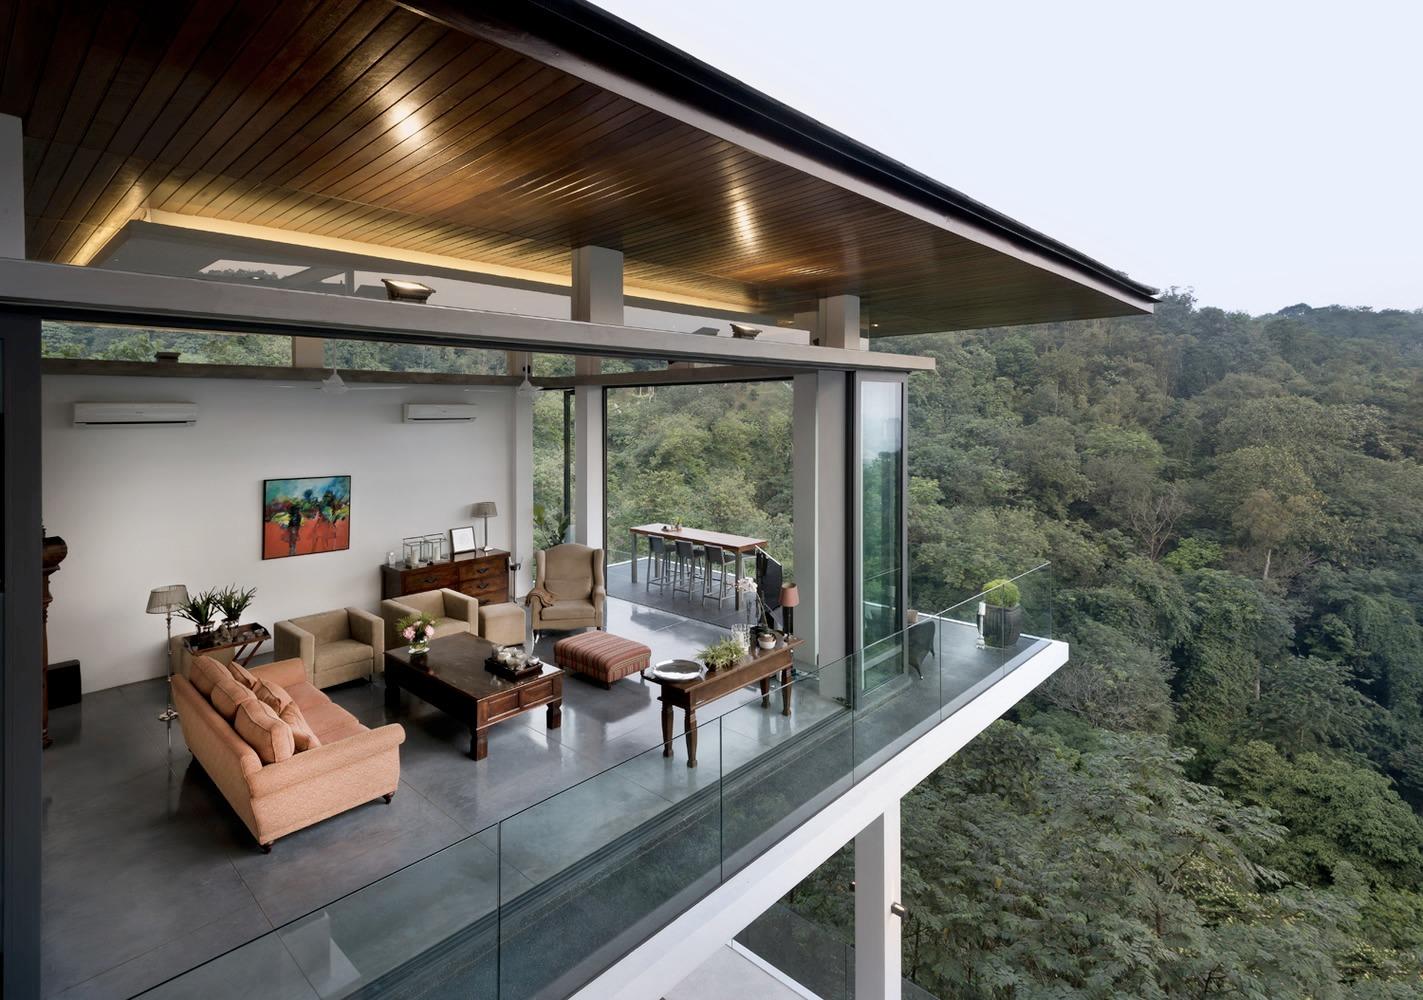 House / 29 Design - architecture - red_wolf | ello